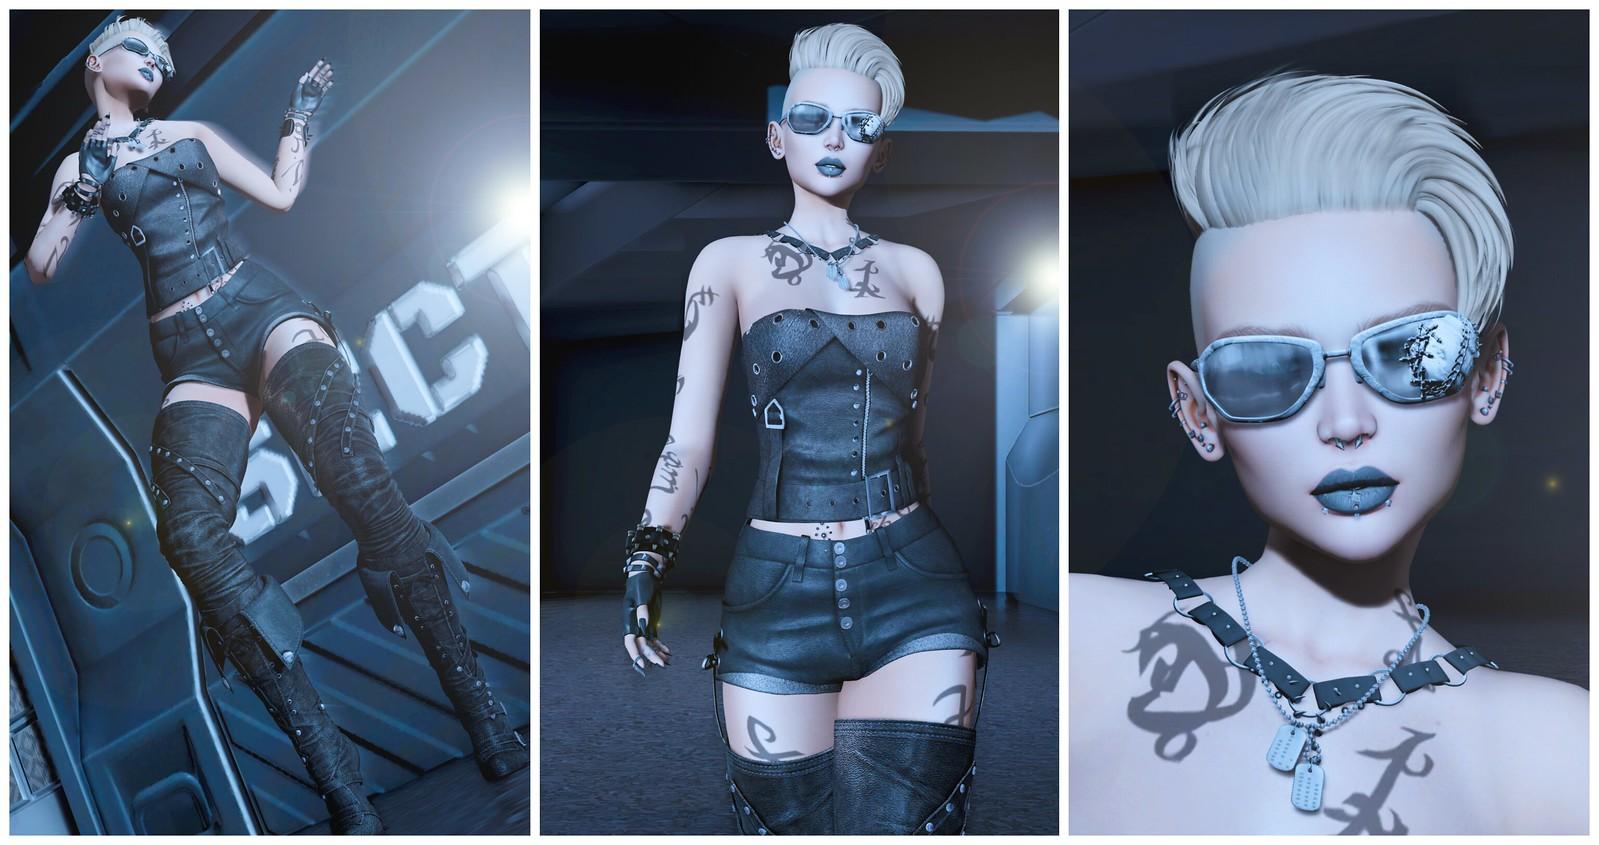 LOTD 1018 - Huntress